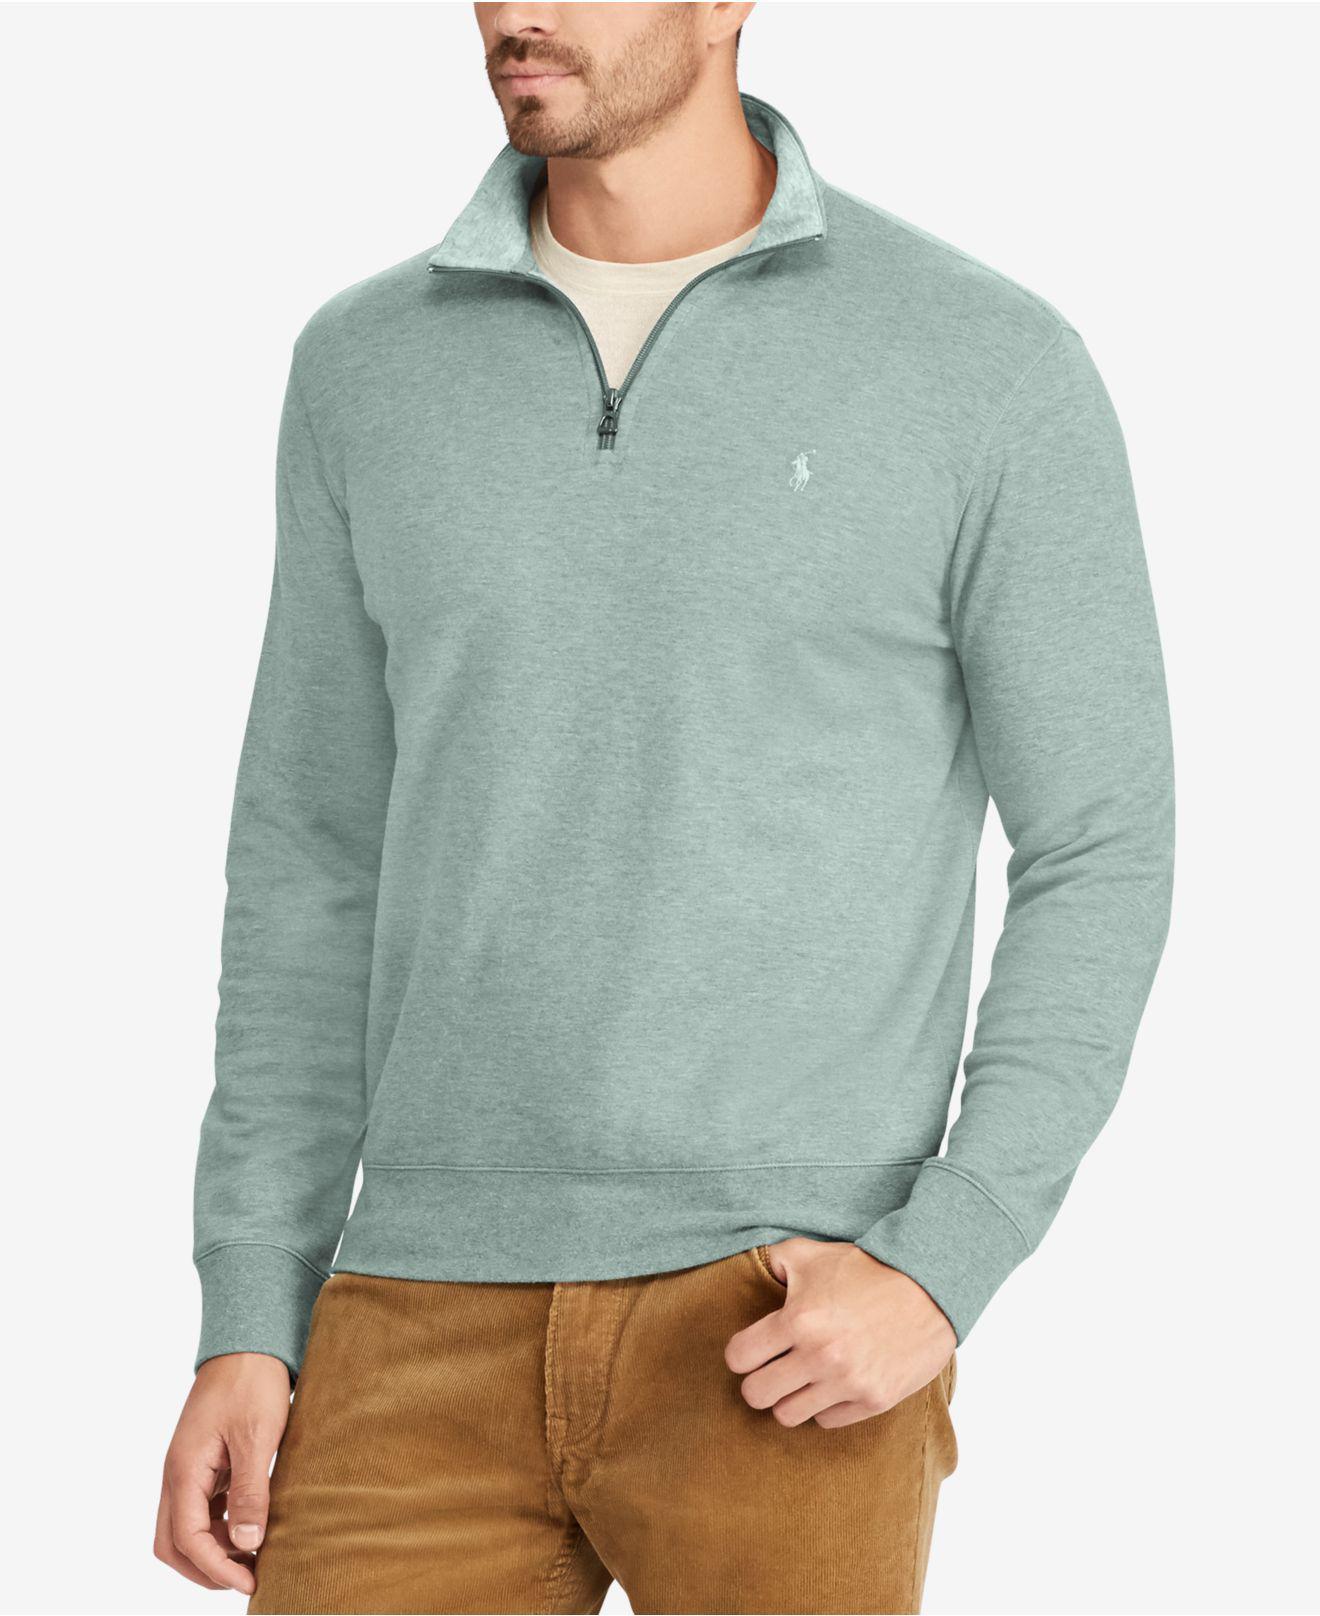 6bbe4a8565718 Lyst - Polo Ralph Lauren Men s Jersey Half-zip Pullover Shirt in ...